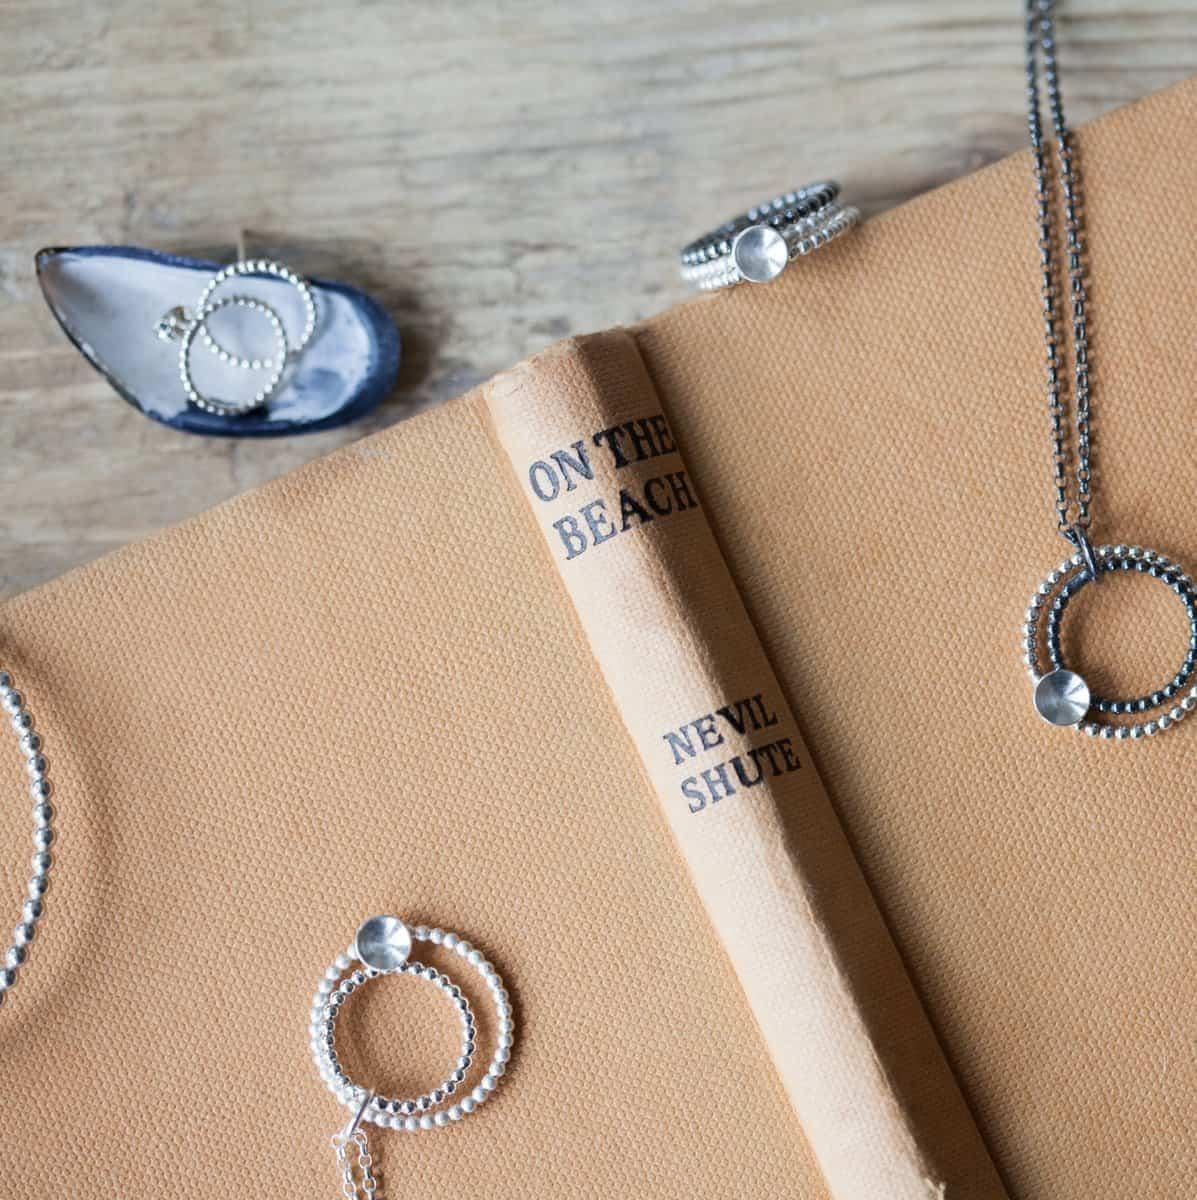 Jewellery collection - jewellery challenge on instagram